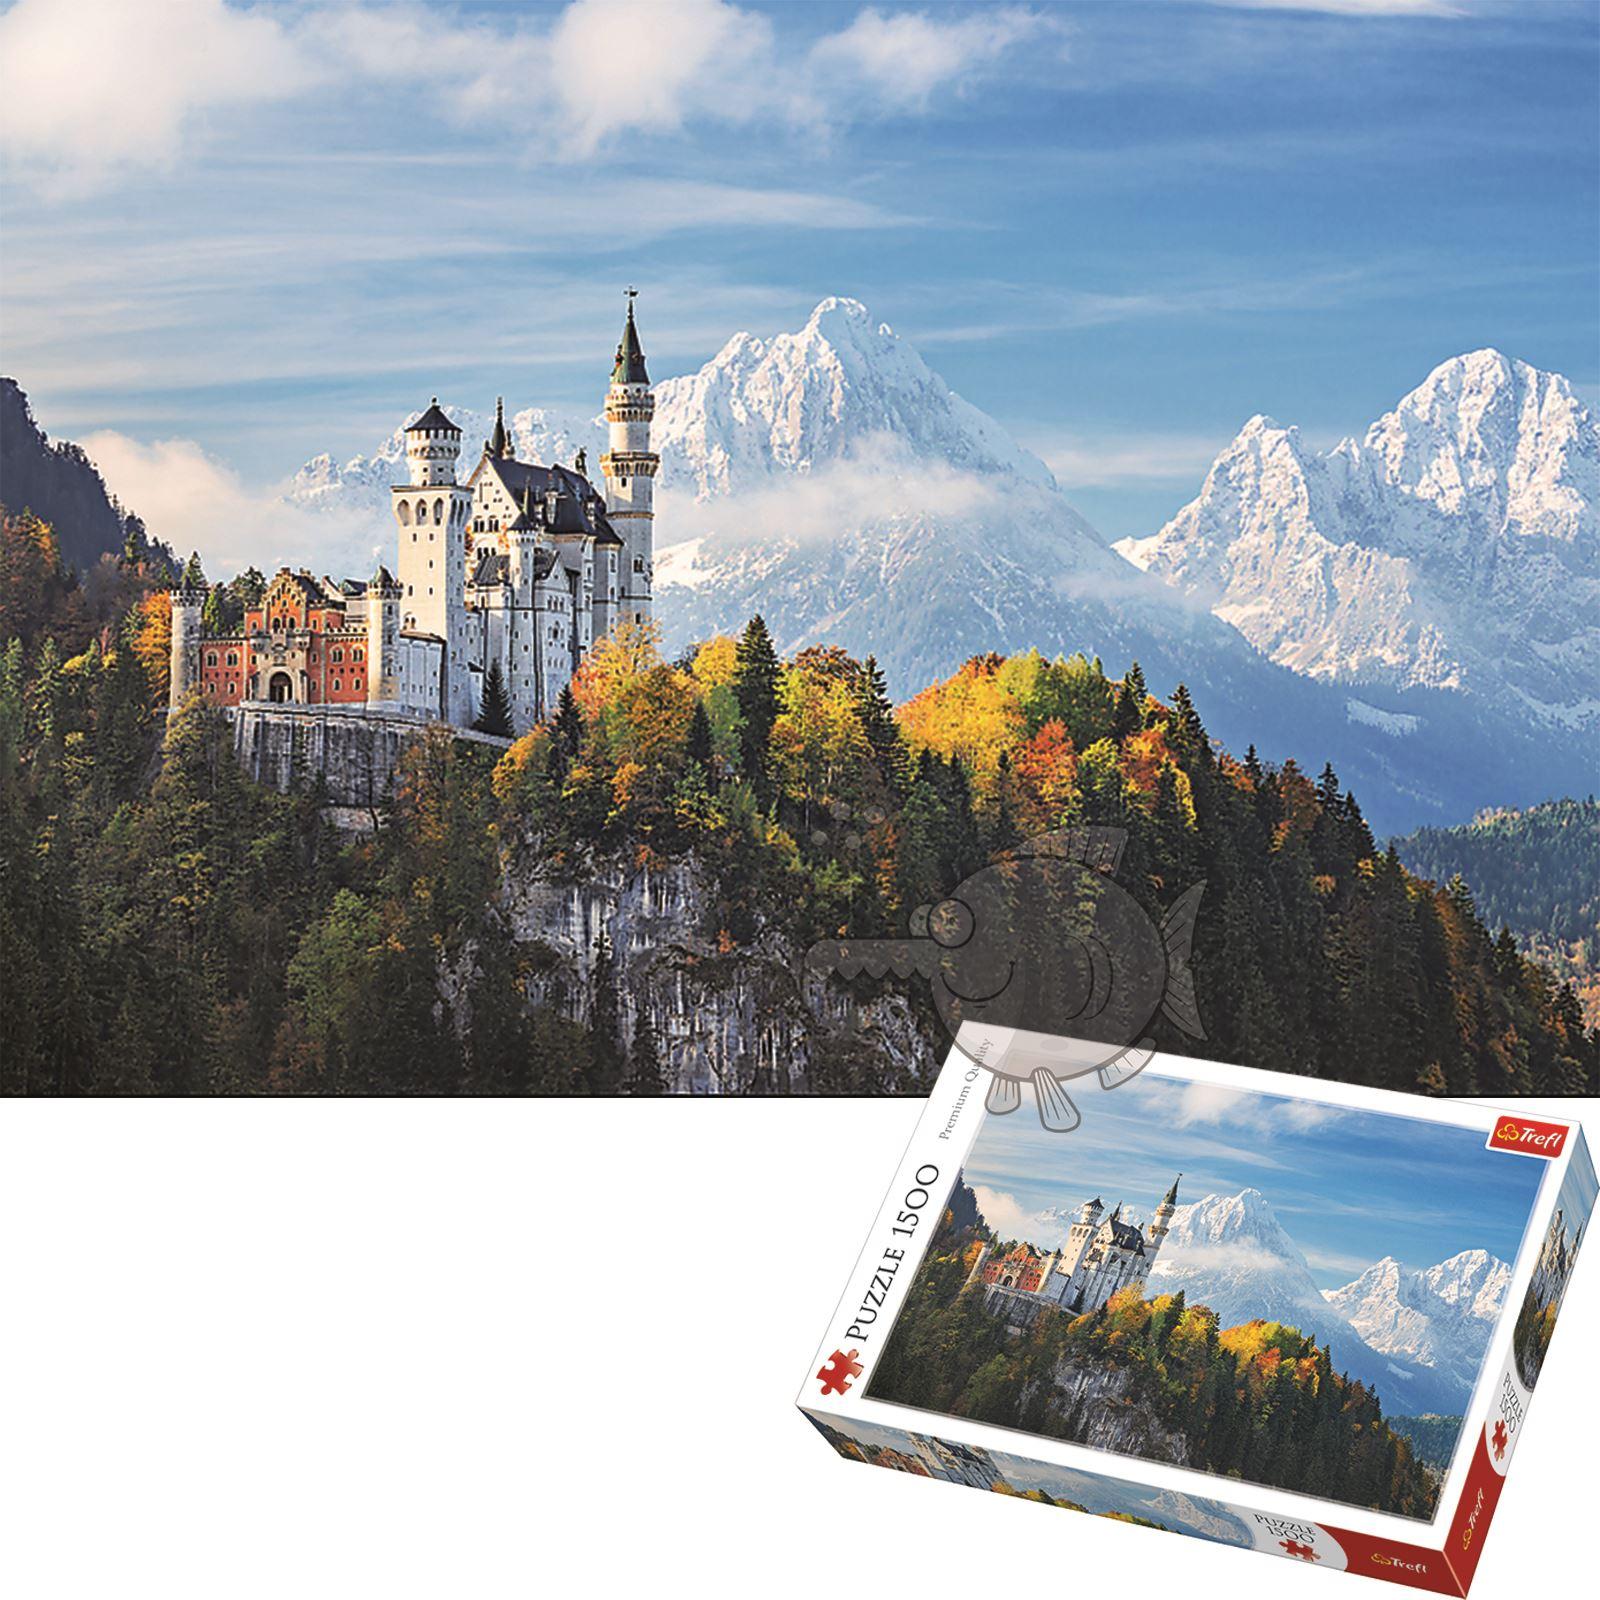 Trefl-300-500-1000-1500-2000-3000-4000-6000-Piece-Jigsaw-Puzzle-Landscapes-City thumbnail 33